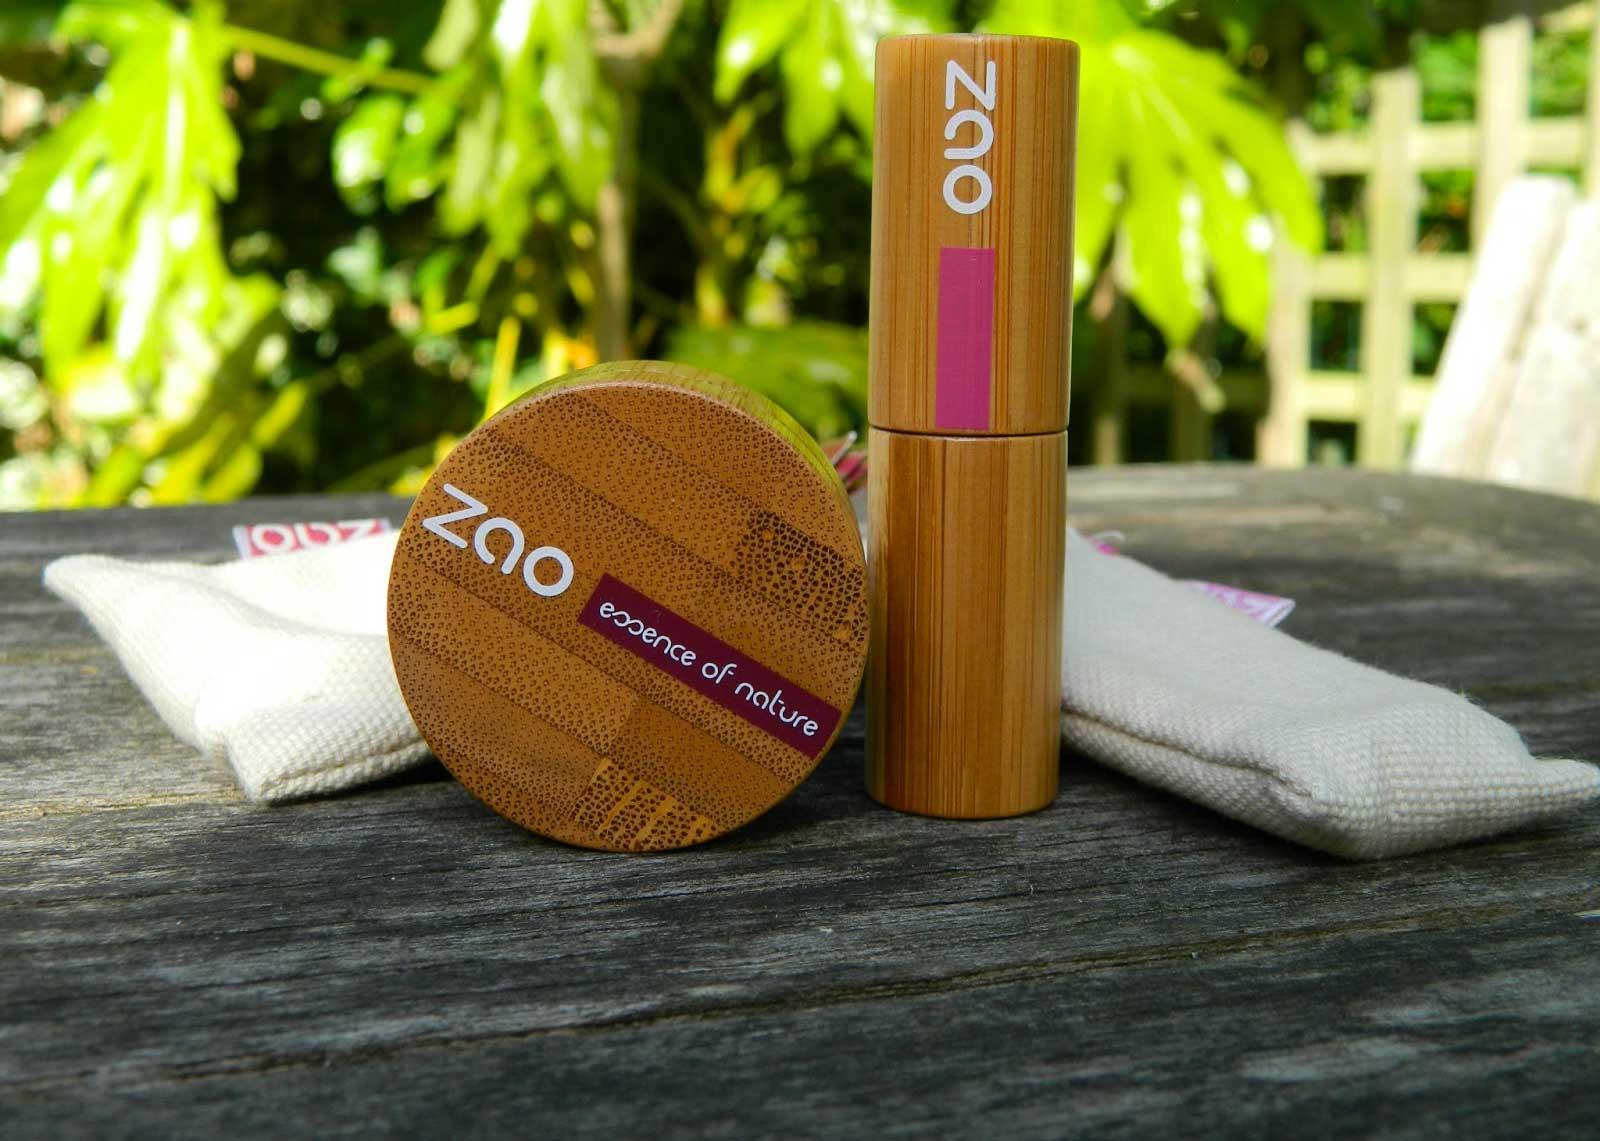 zao-makeup-prezzi-bergamo-cosmetici